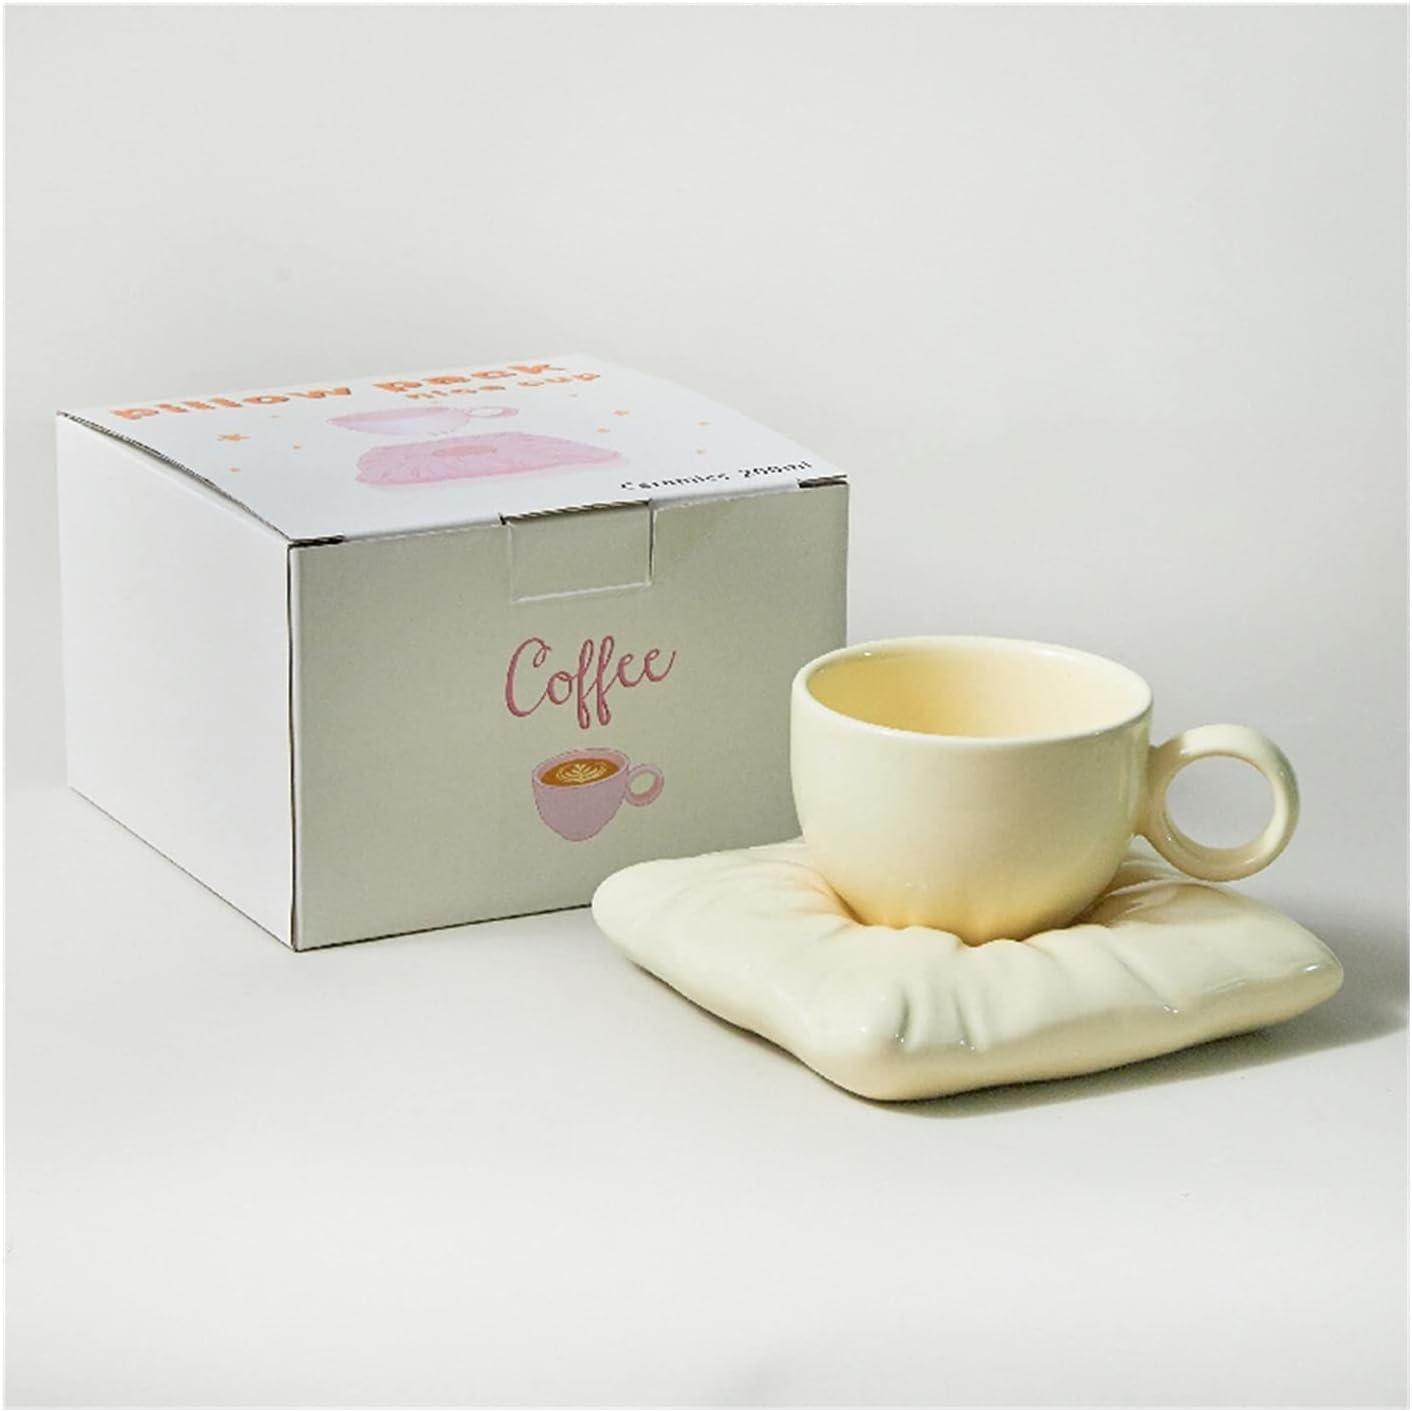 Coffee Mugs Ceramic Cup With supreme Pillow Max 68% OFF Coff Creative Coaster Couple